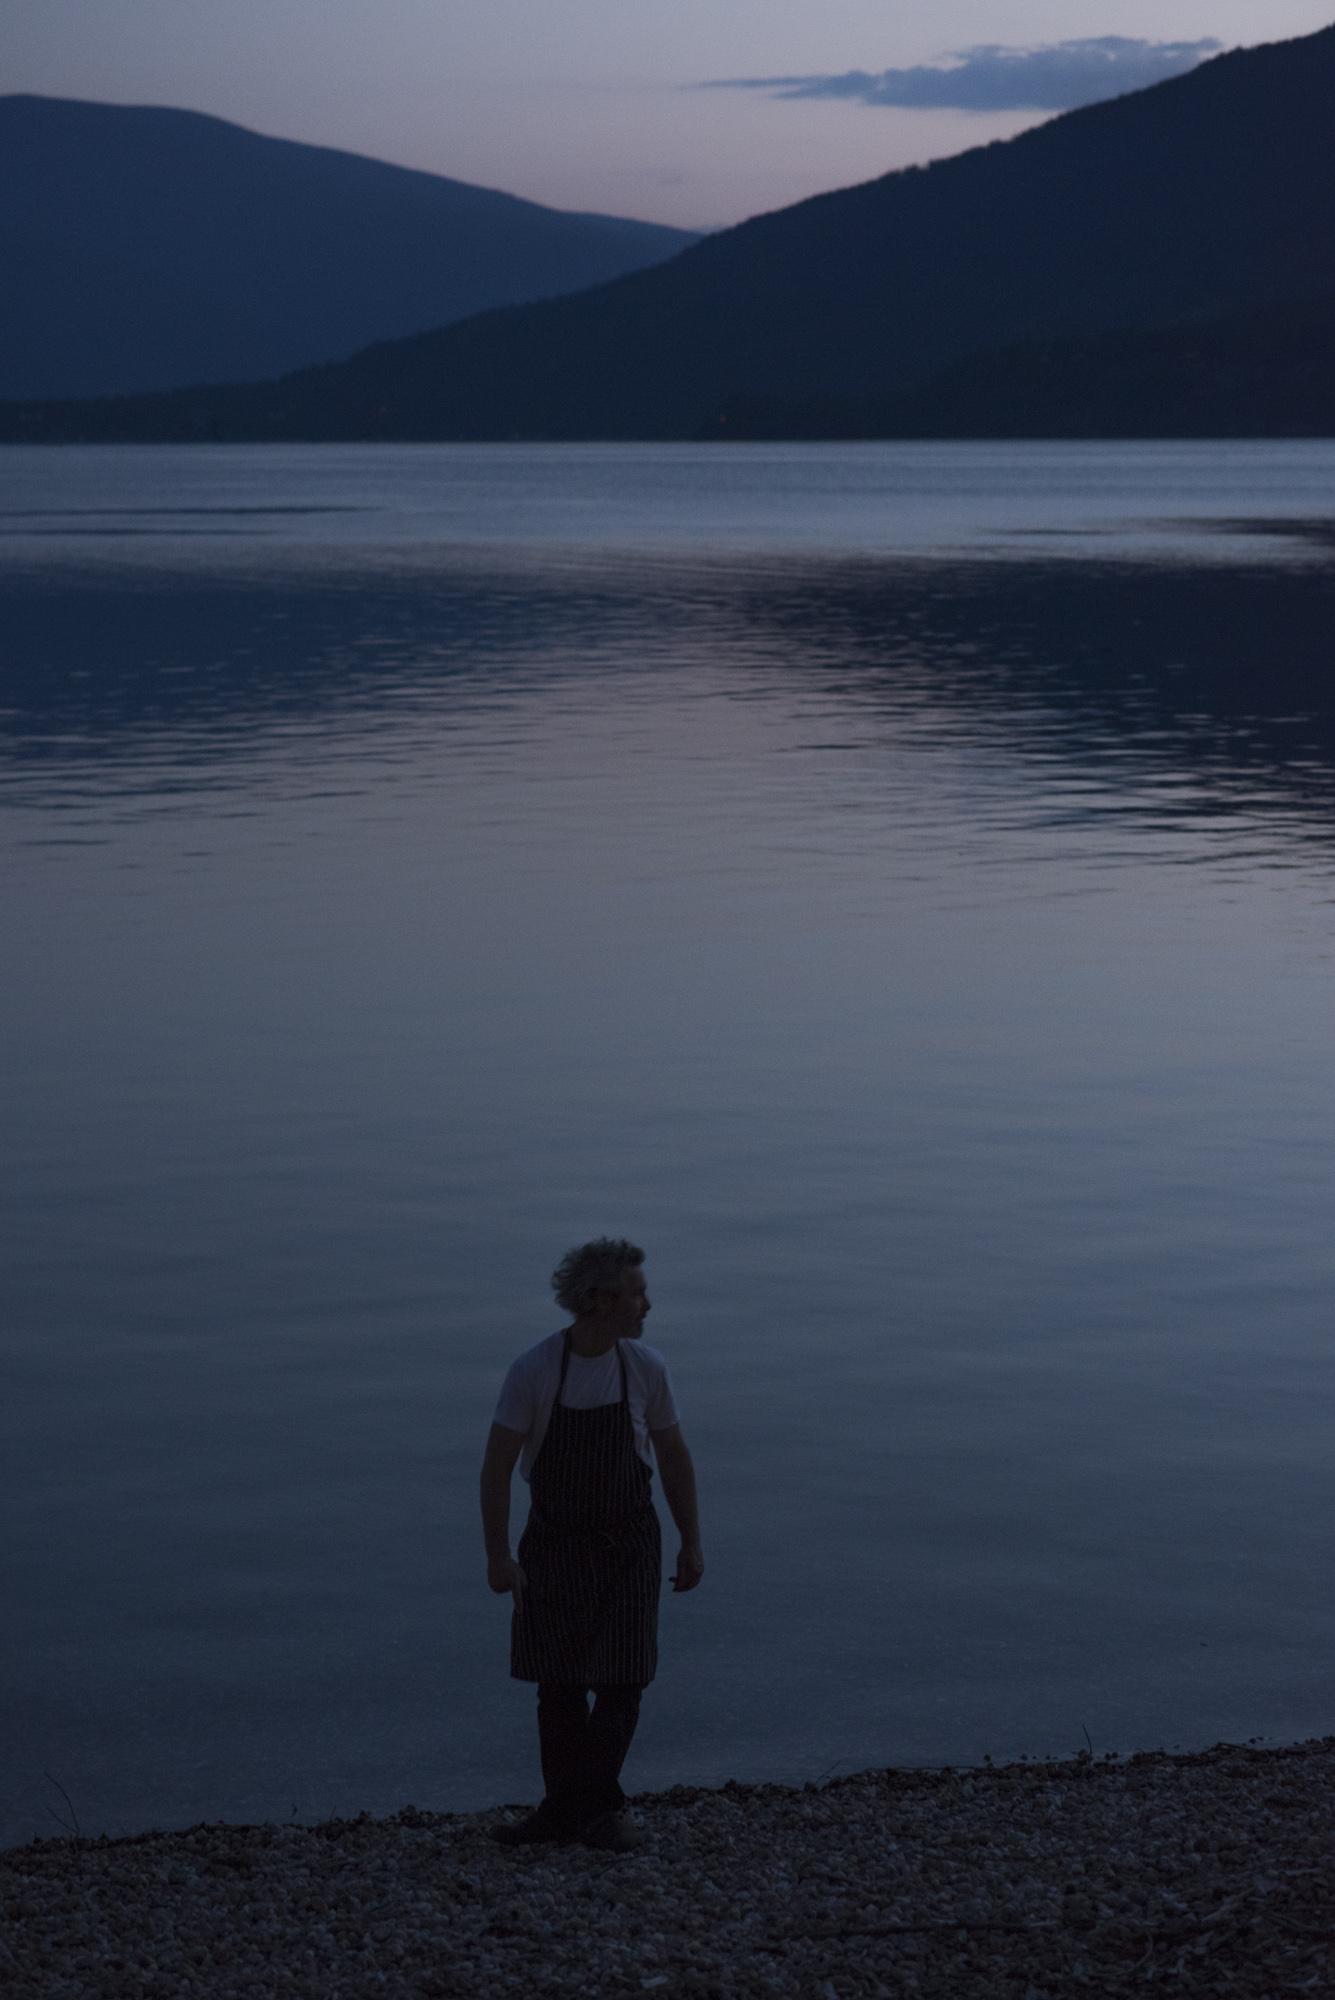 cabin-Kootenay lake dus, Jason.jpg